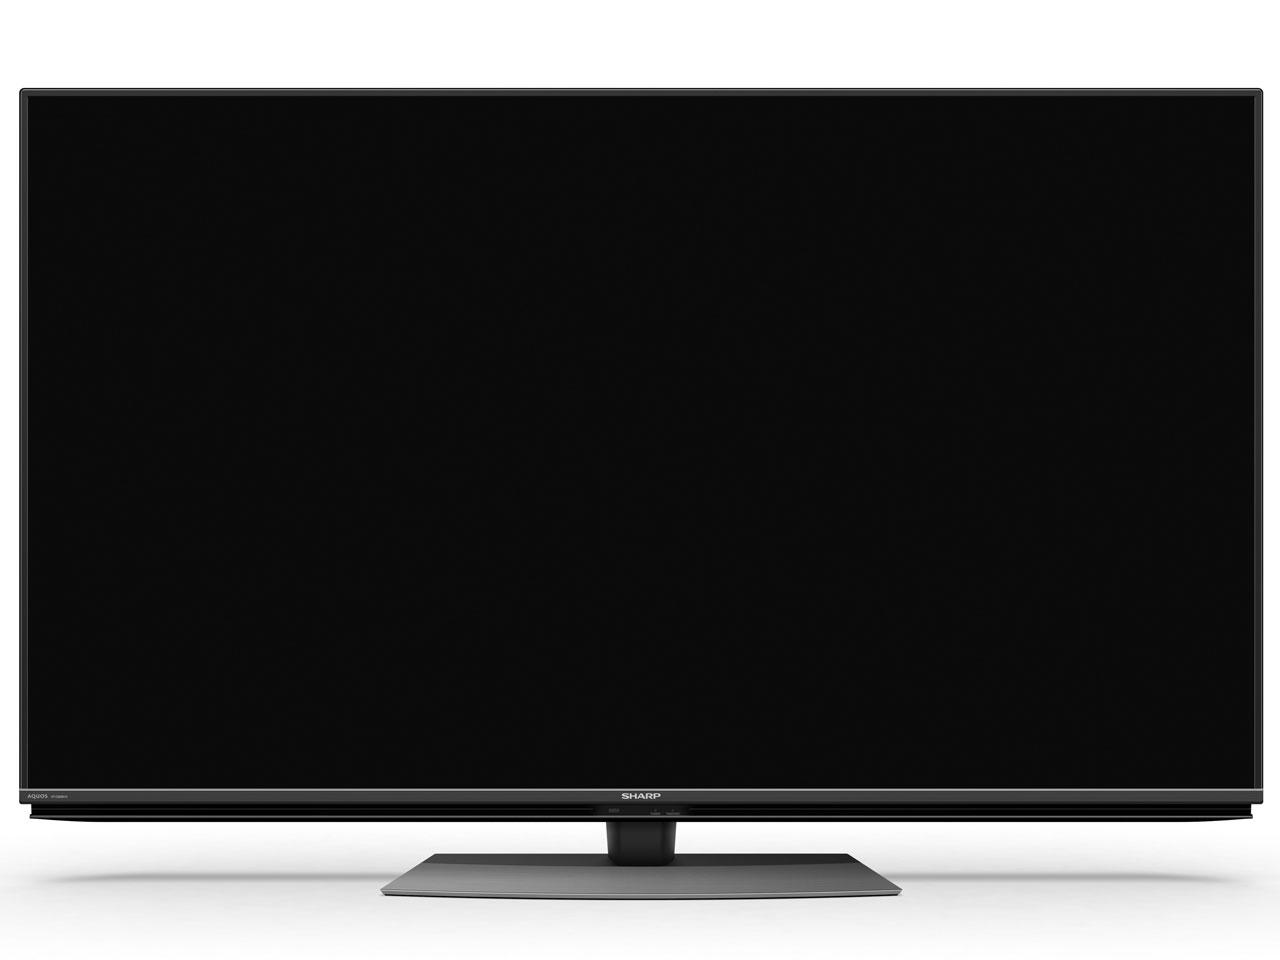 シャープ AQUOS 60V型地上・BS・110度CSデジタル4Kチューナー内蔵 LED液晶テレビ4T-C60BH1